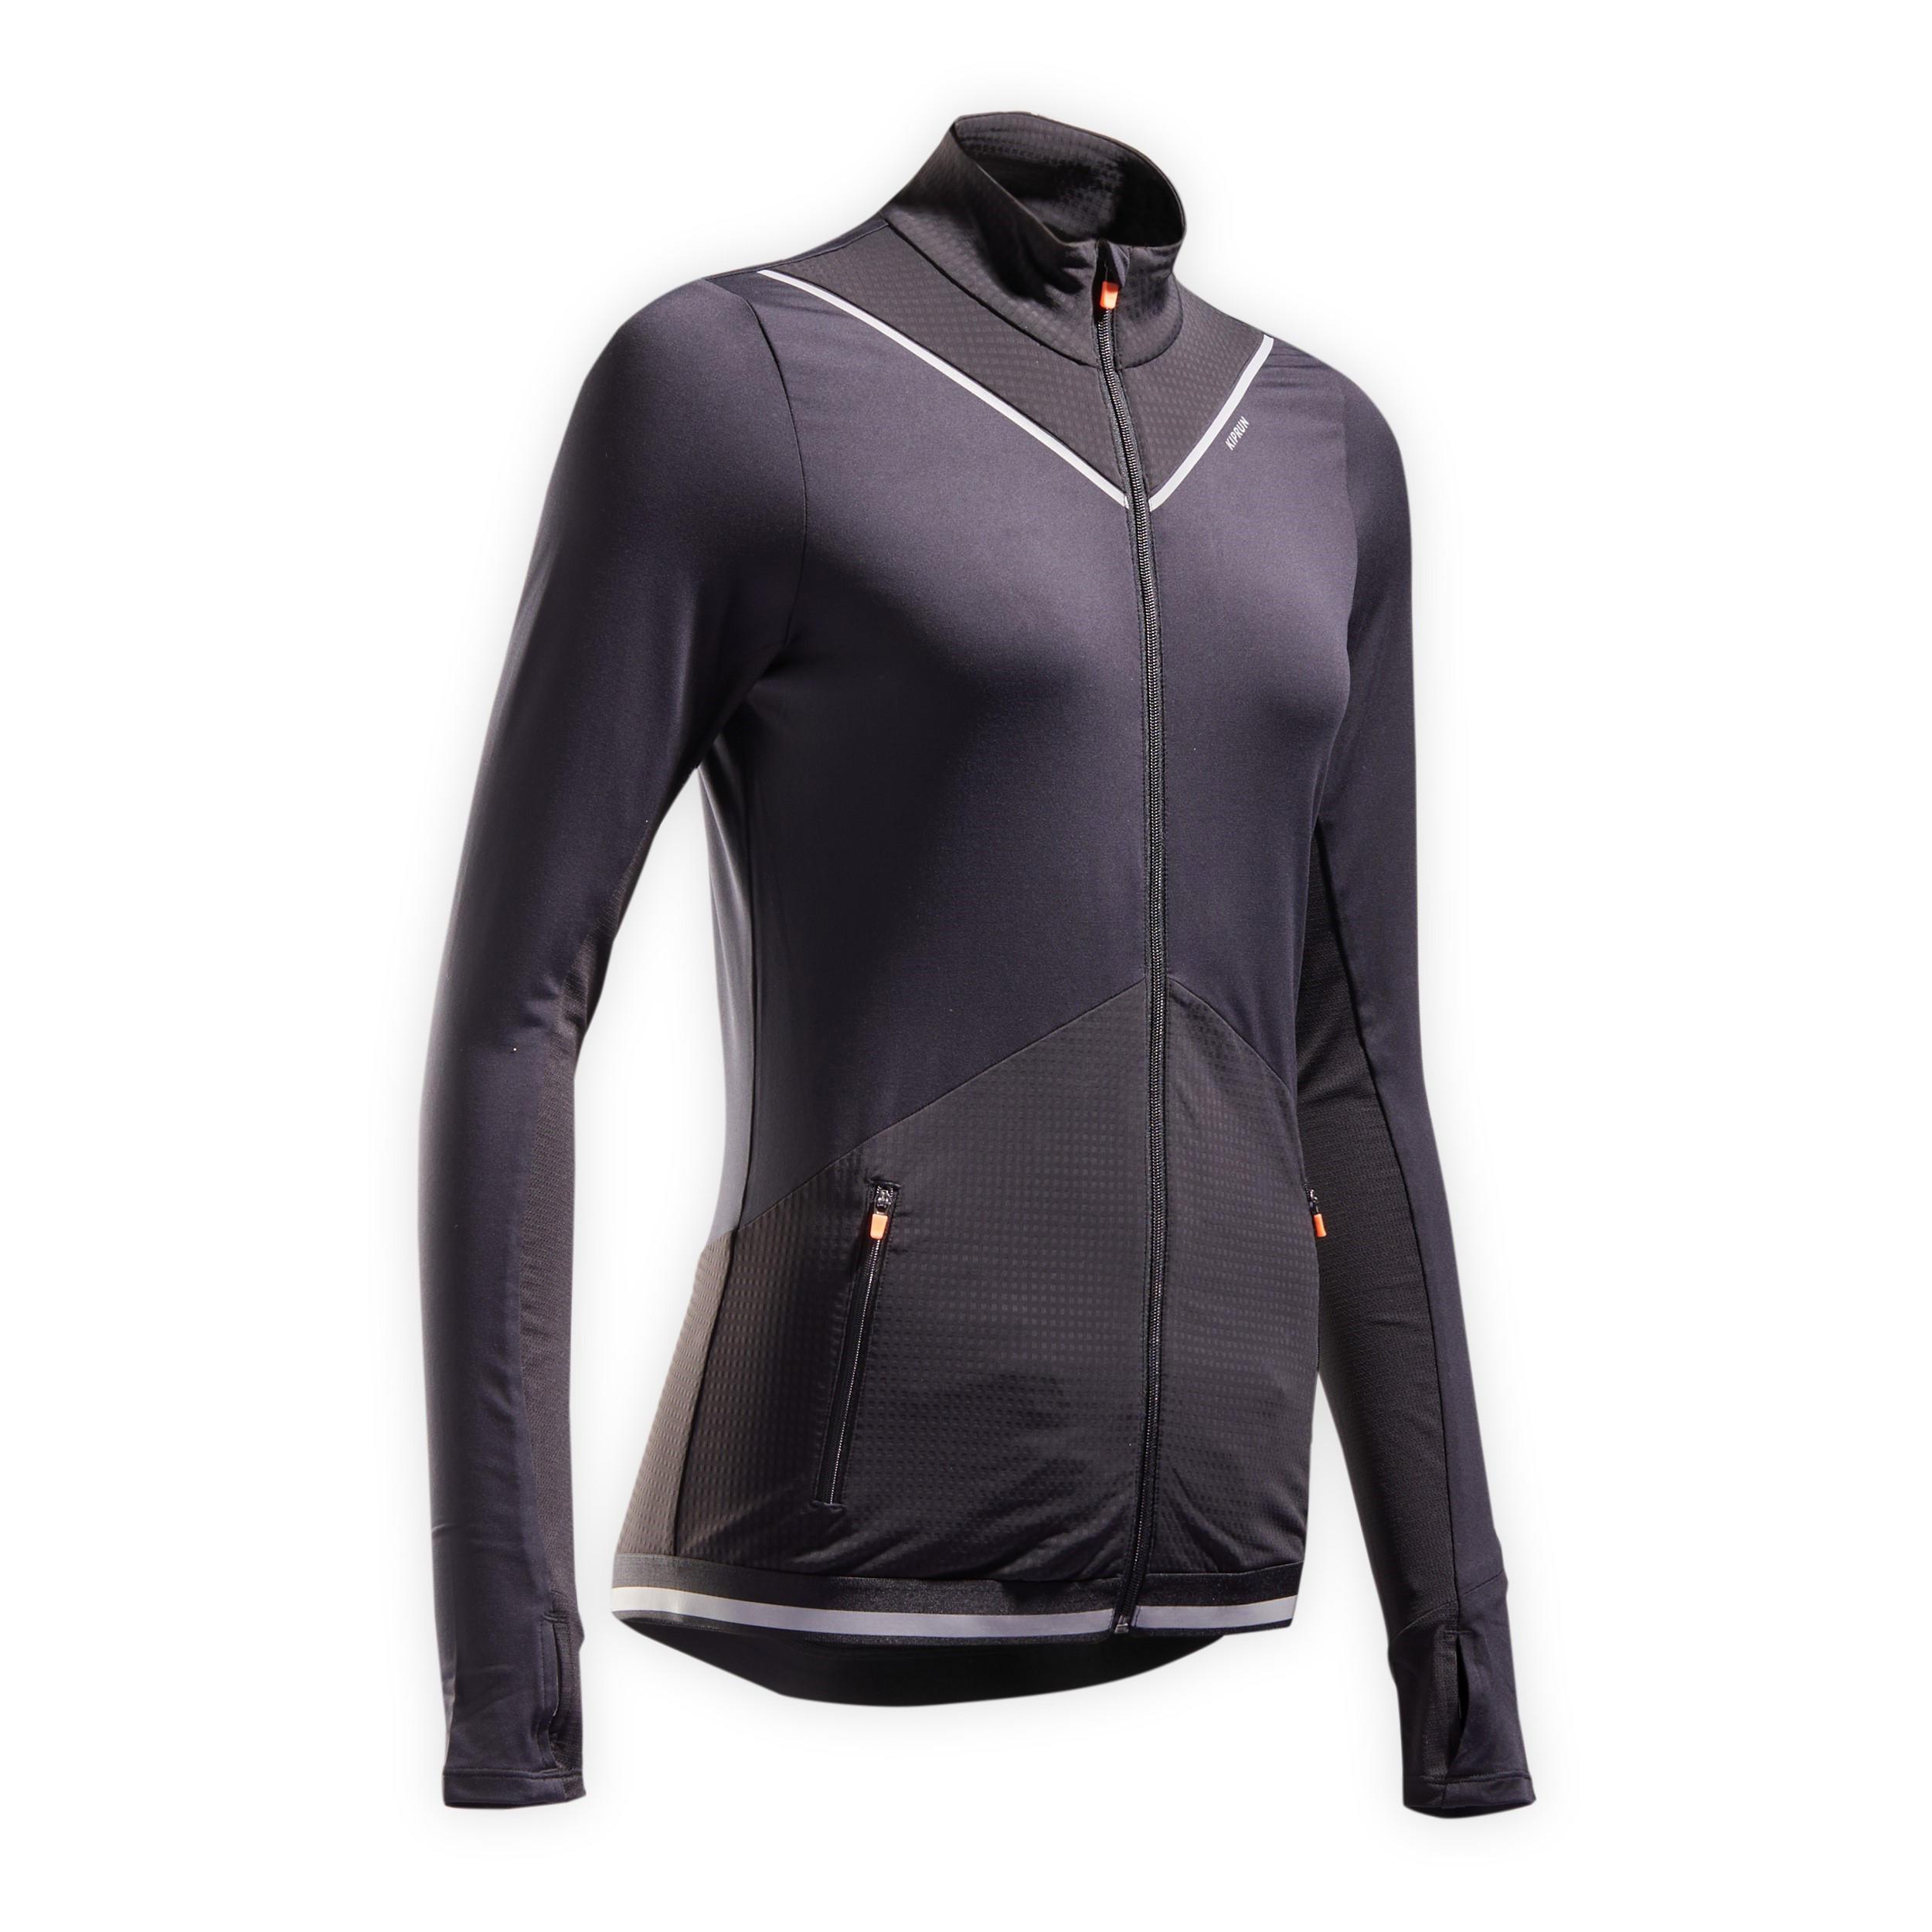 Jachetă Alergare Kiprun Light